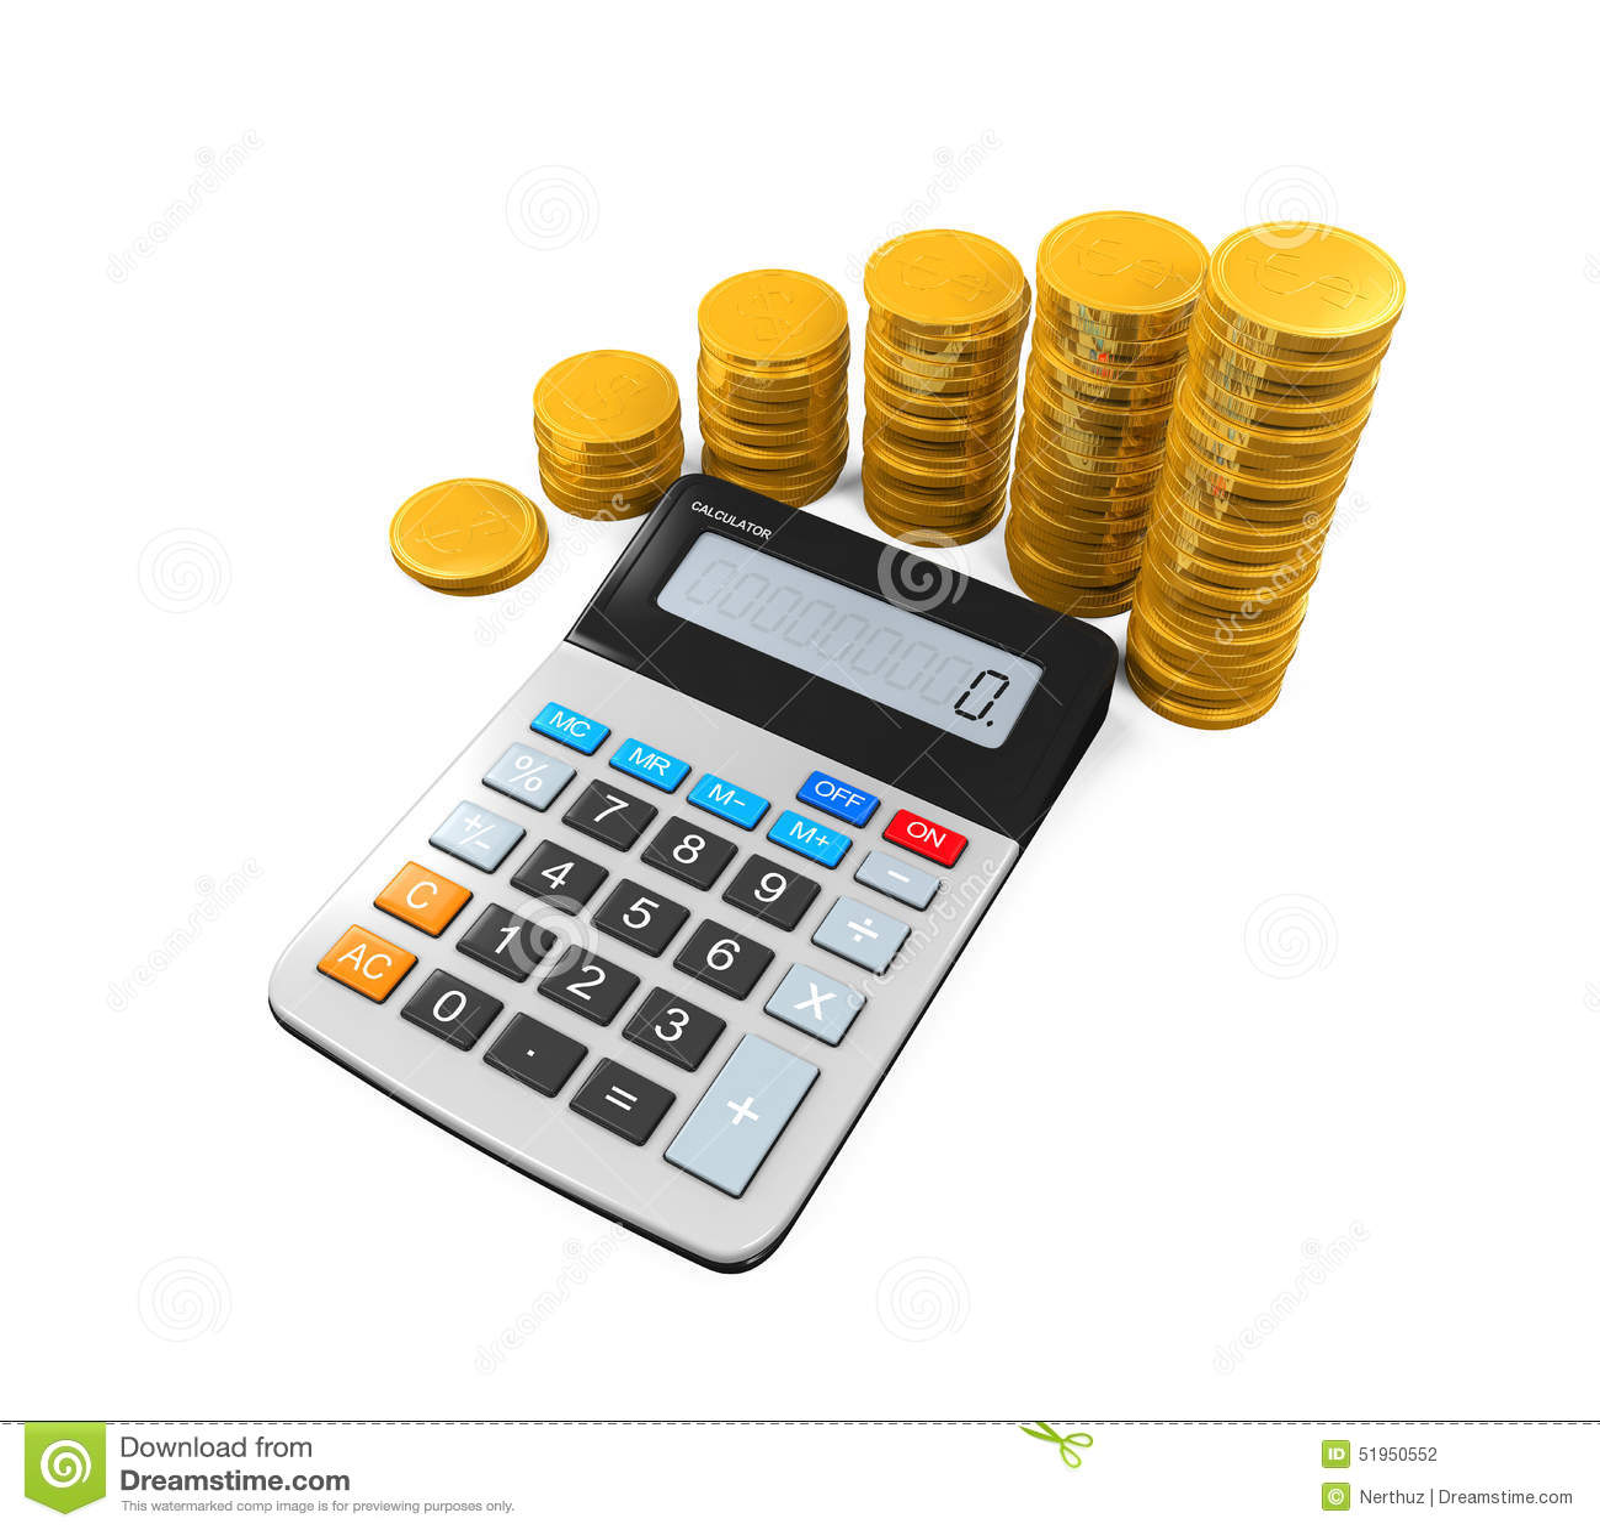 8bt coin design calculator / Xspec coin cap locations